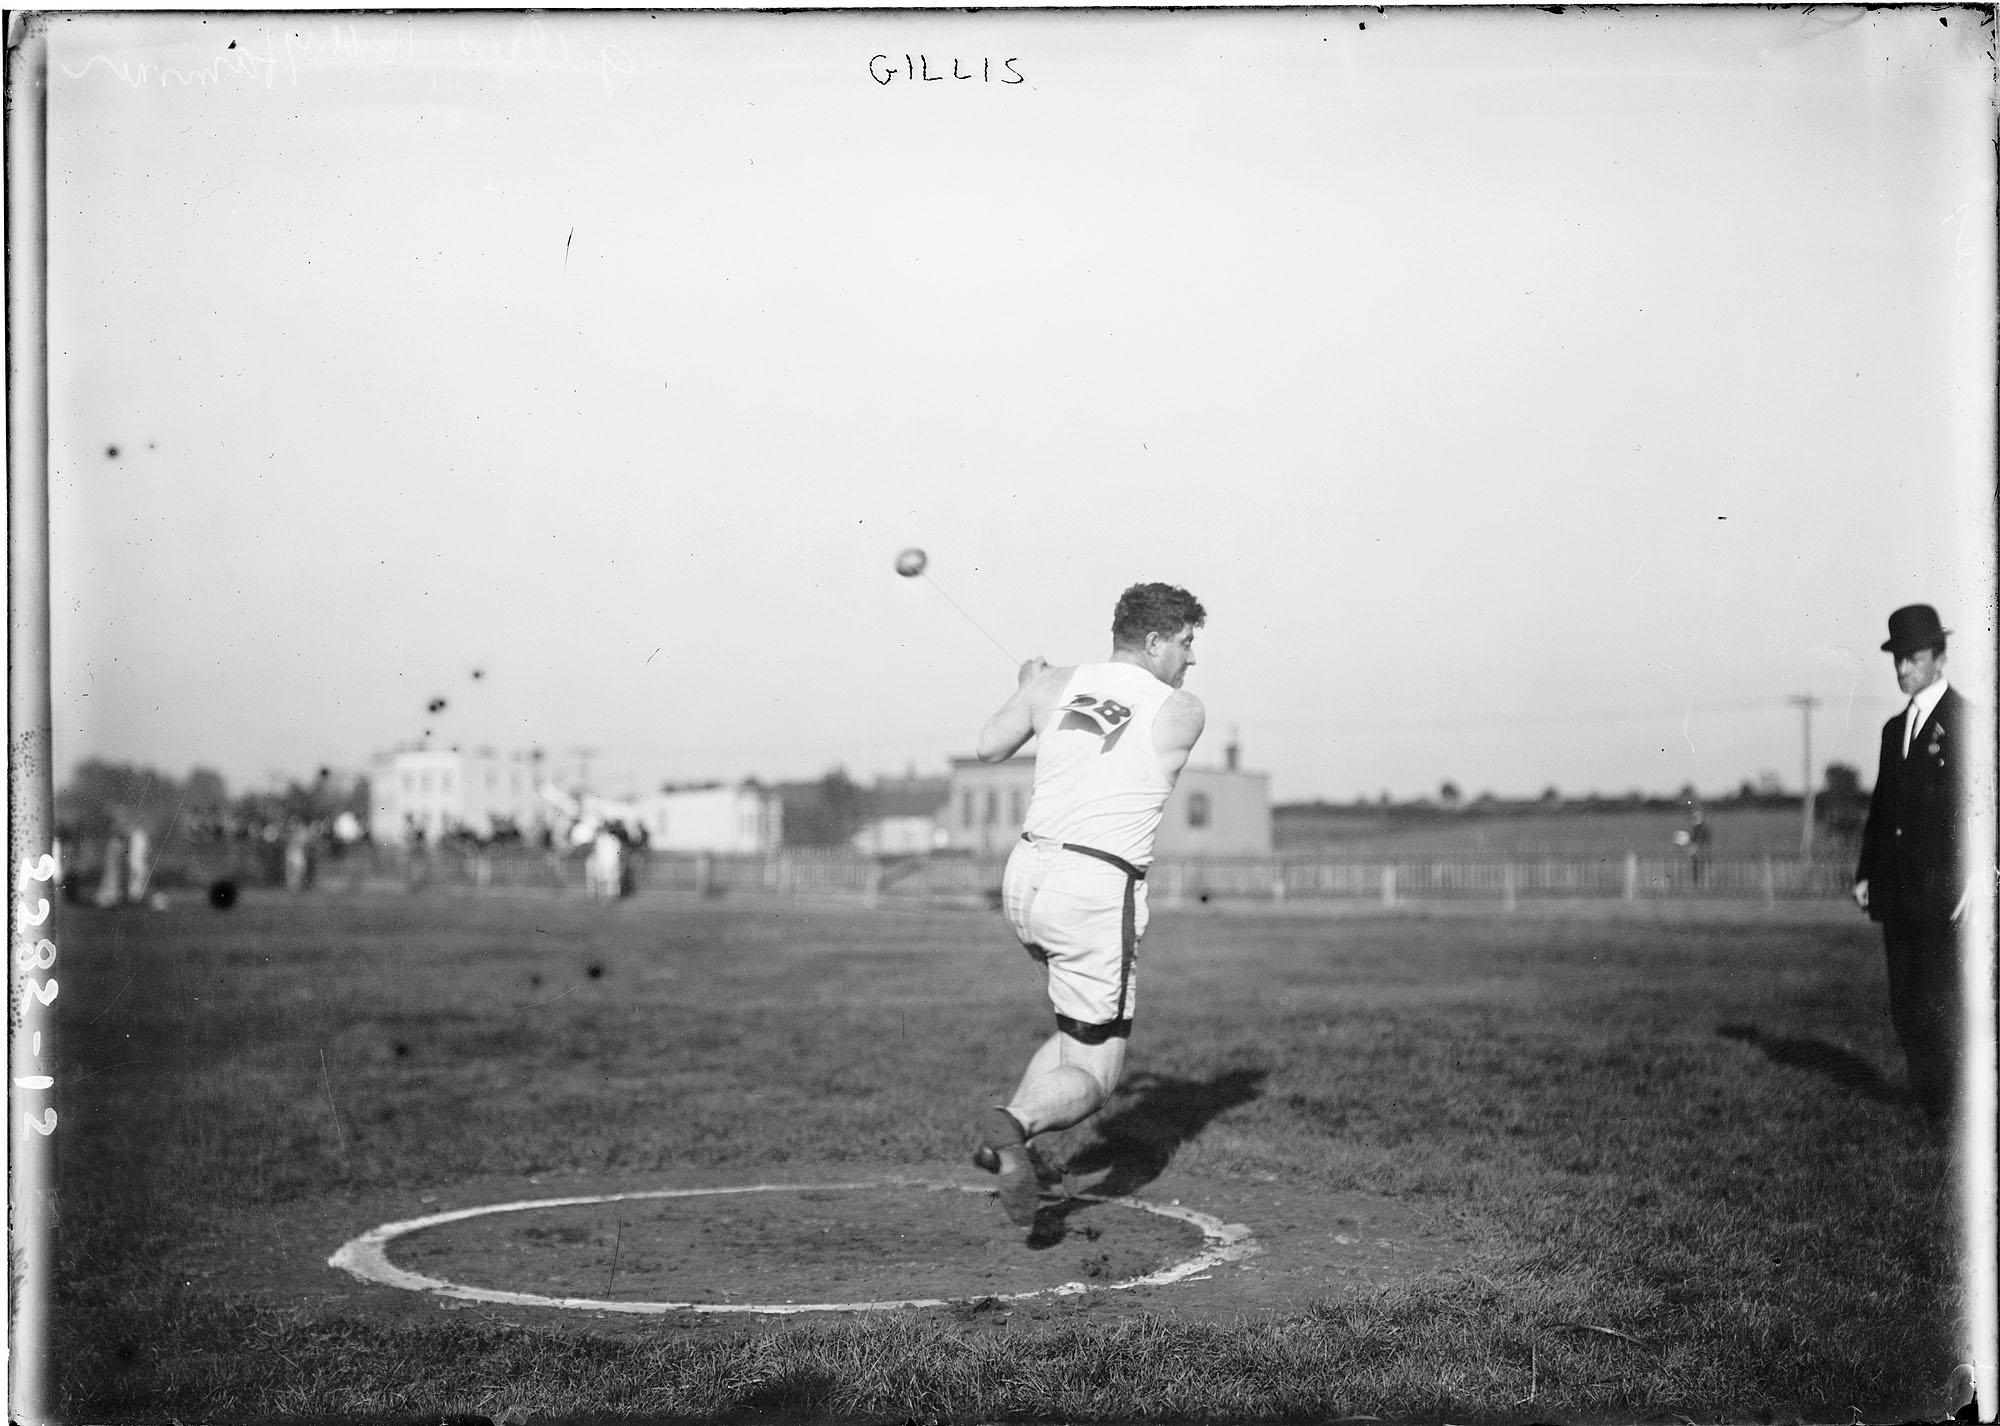 1912 Stockholm Summer Olympics - Duncan Gillis